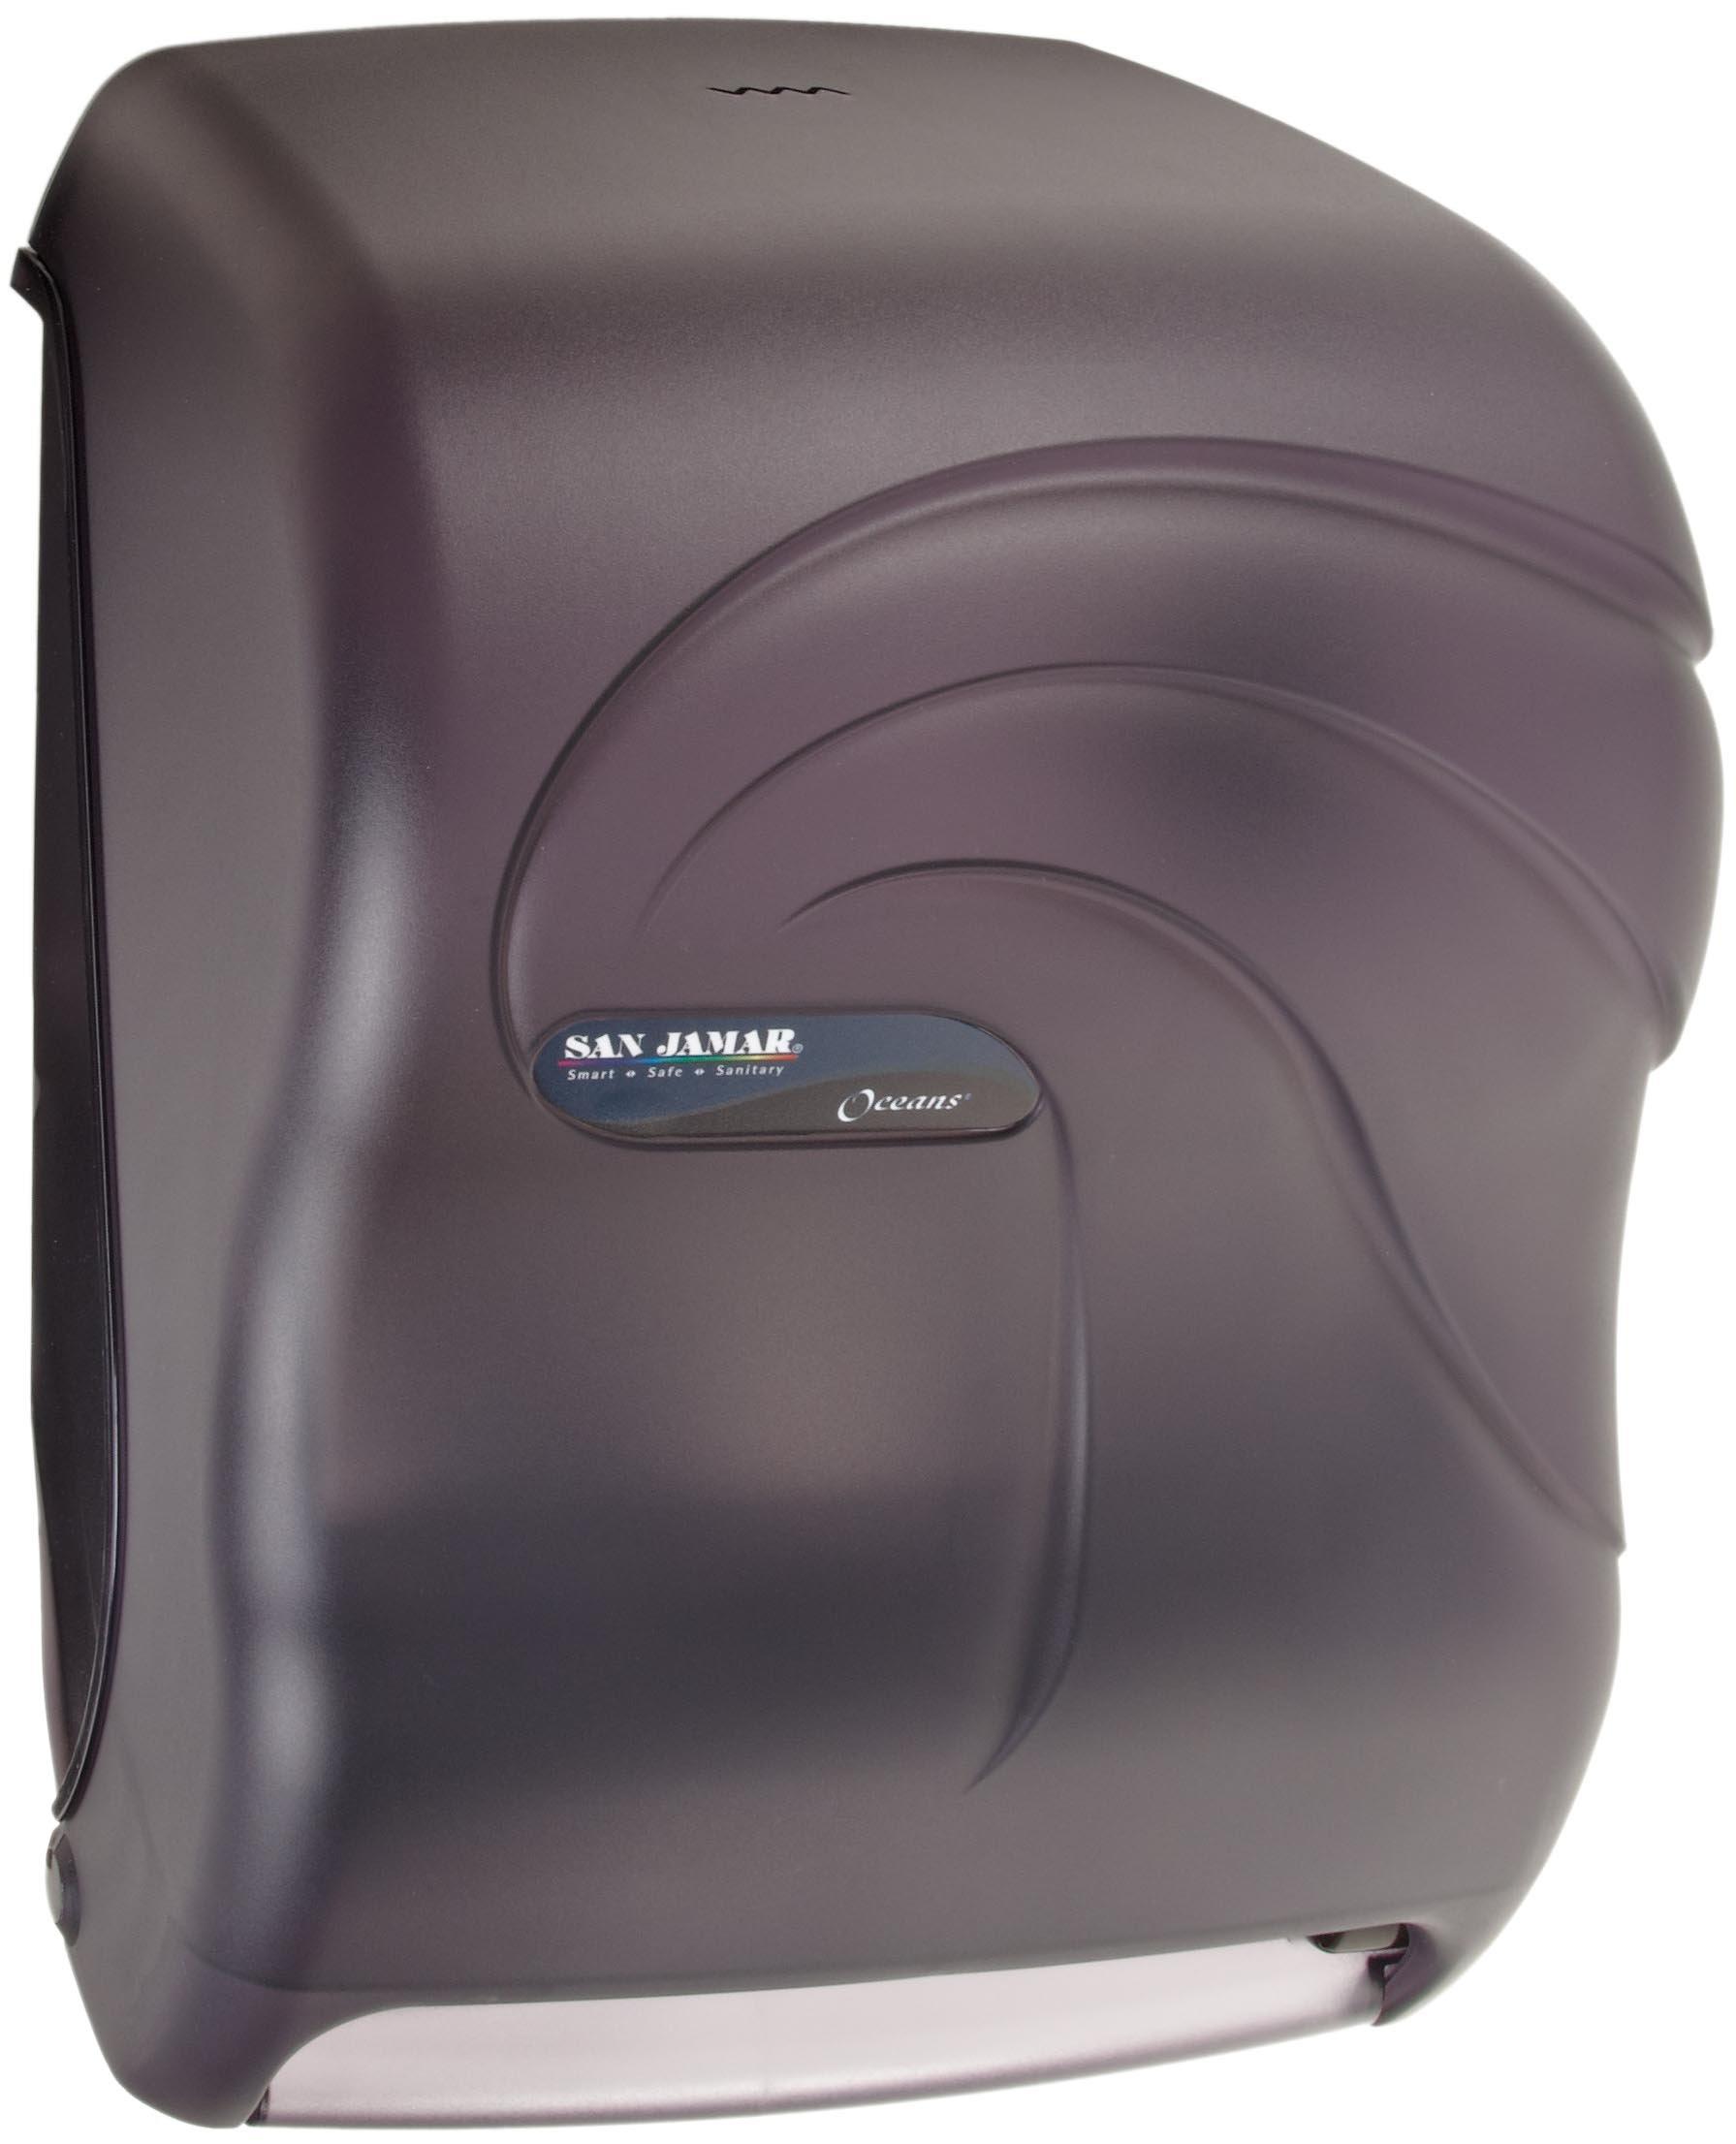 Oceans T1490TBK 11-3/4'' Width x 15-1/2'' Height x 9-1/2'' Depth, Black Pearl Smart System with iQ Sensor Roll Towel Dispenser